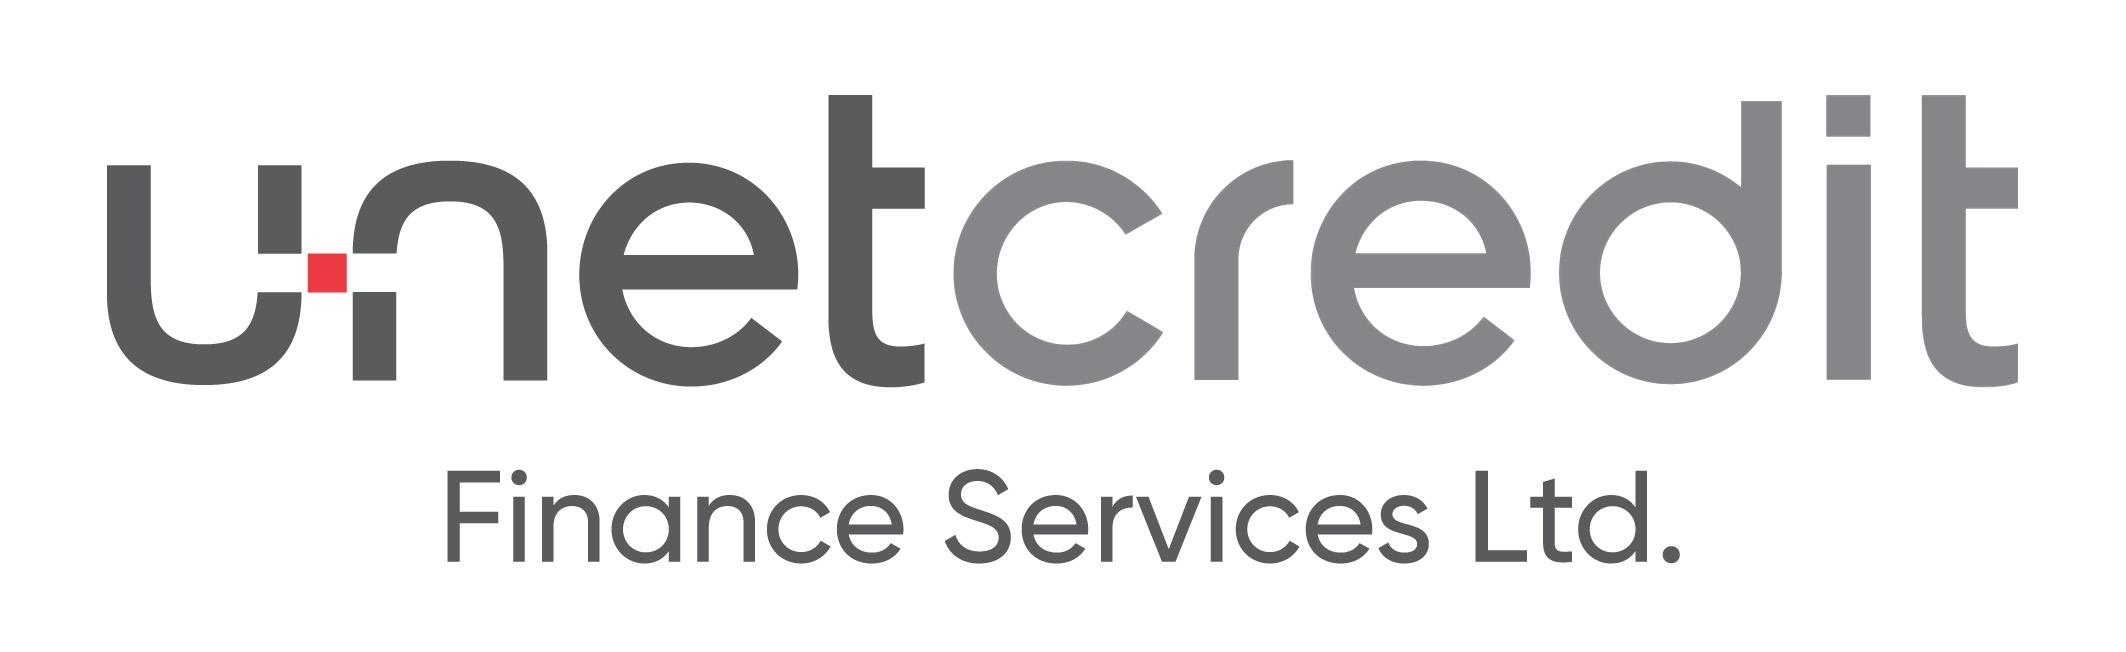 unetcredit - לקוח מרוצה - חברת עורכי דין פדר